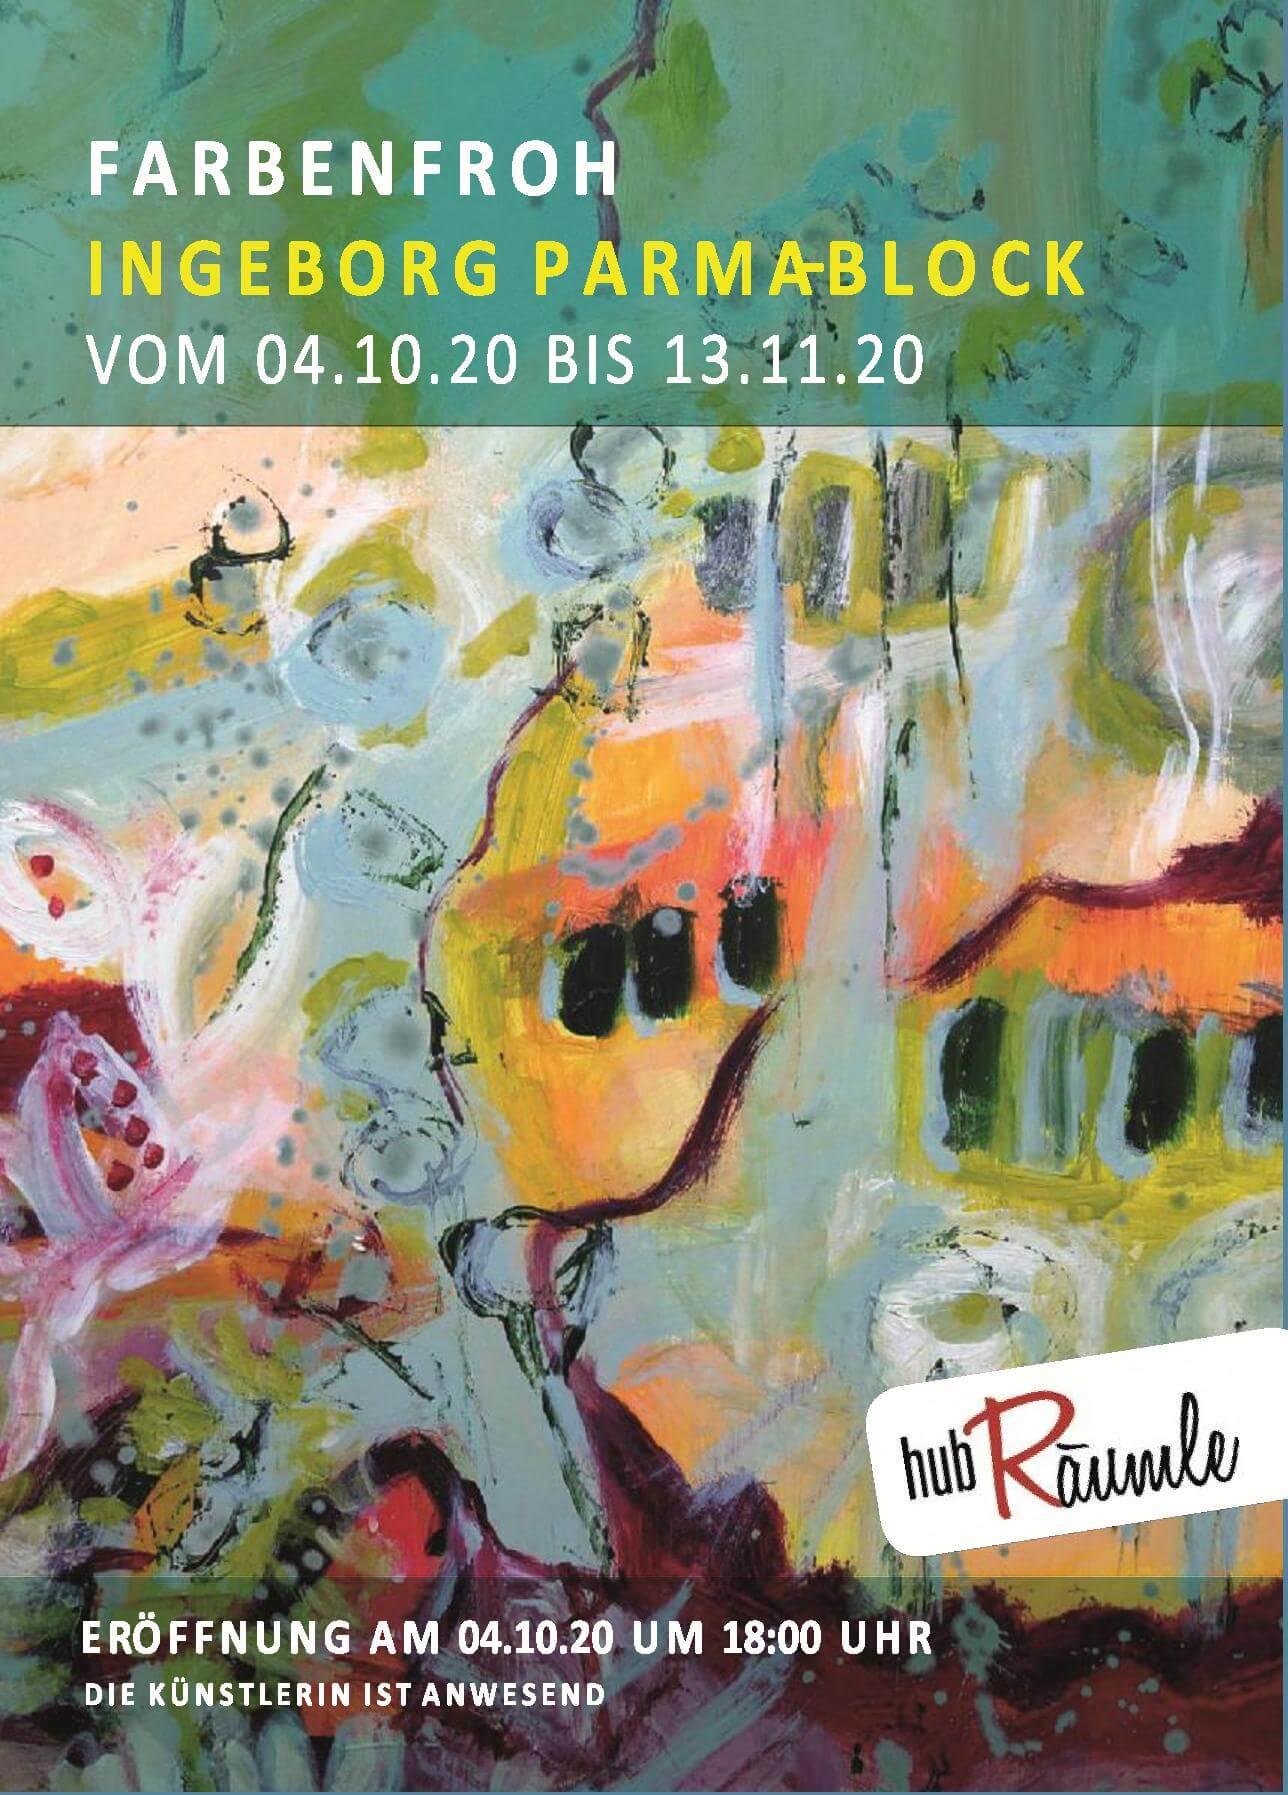 parma-block-hubraeumle_flyer